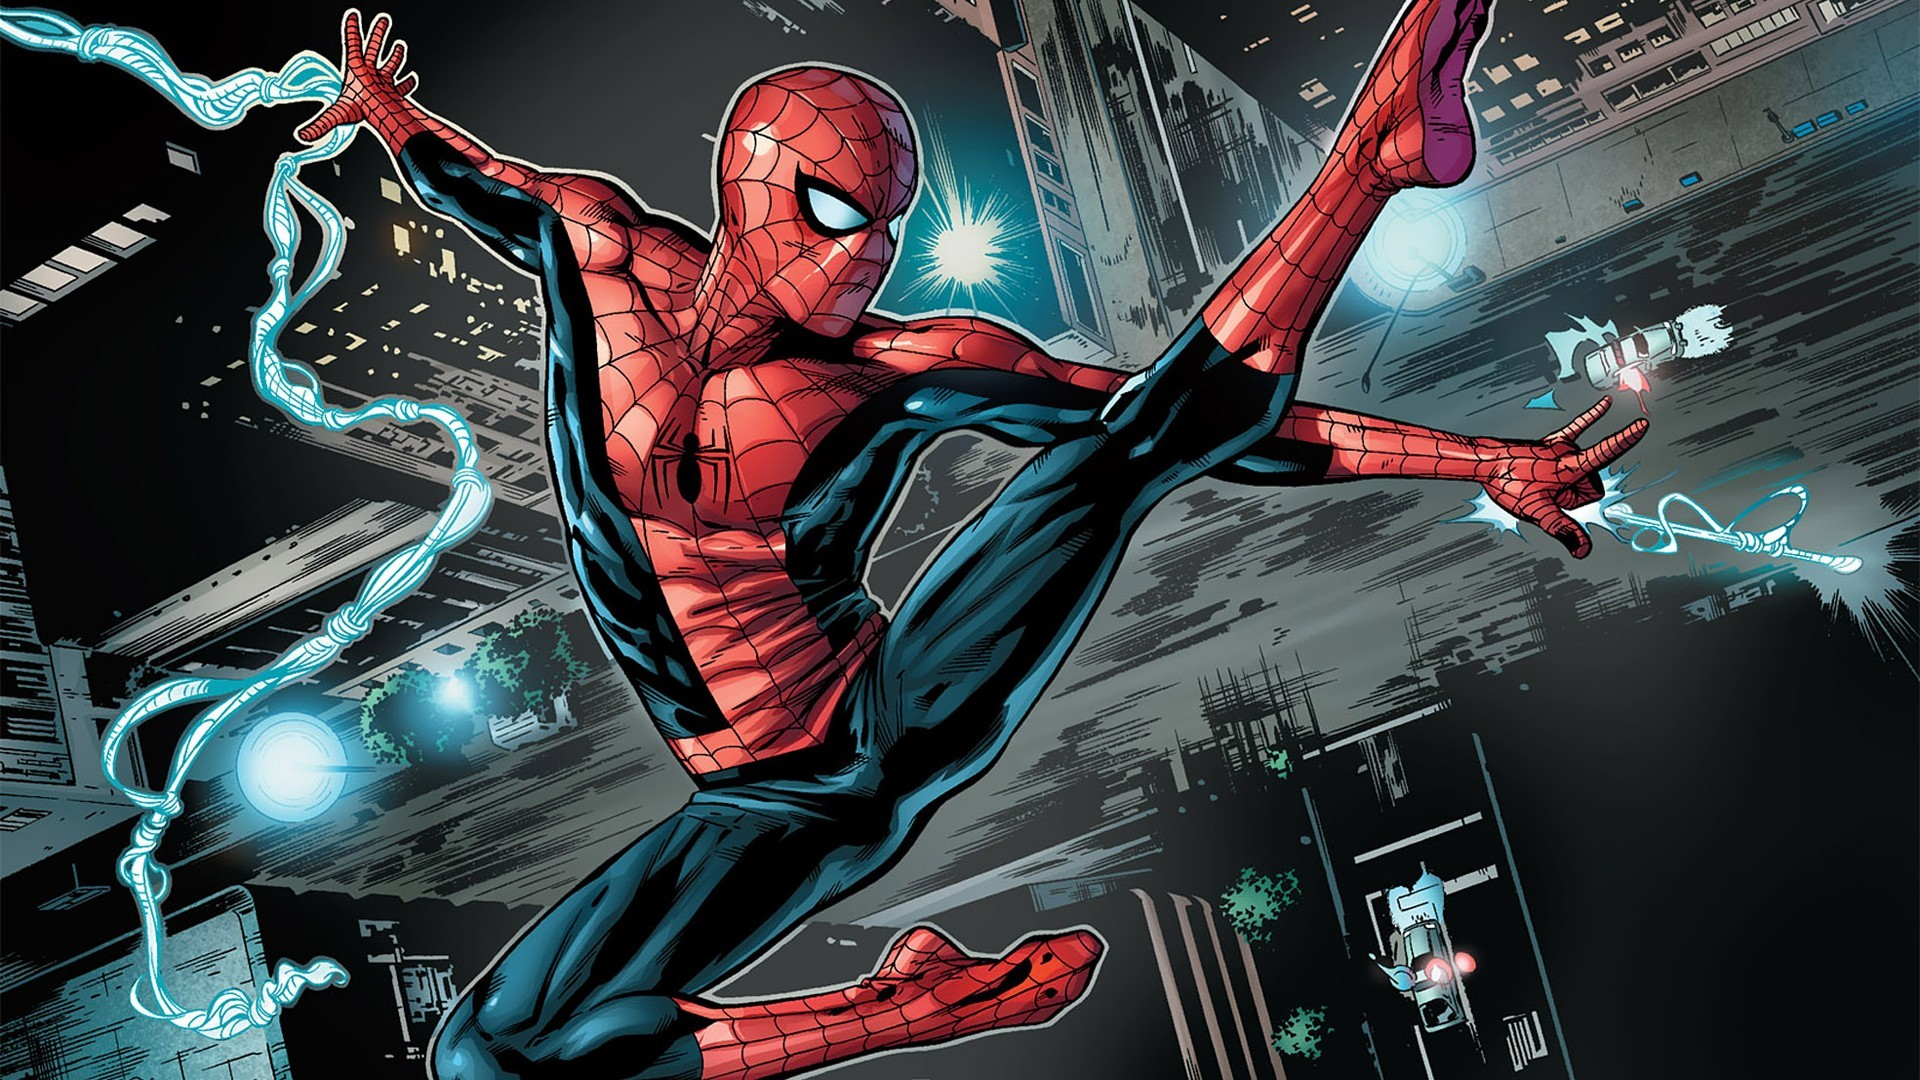 Spiderman Cartoon Wallpaper (75+ images)